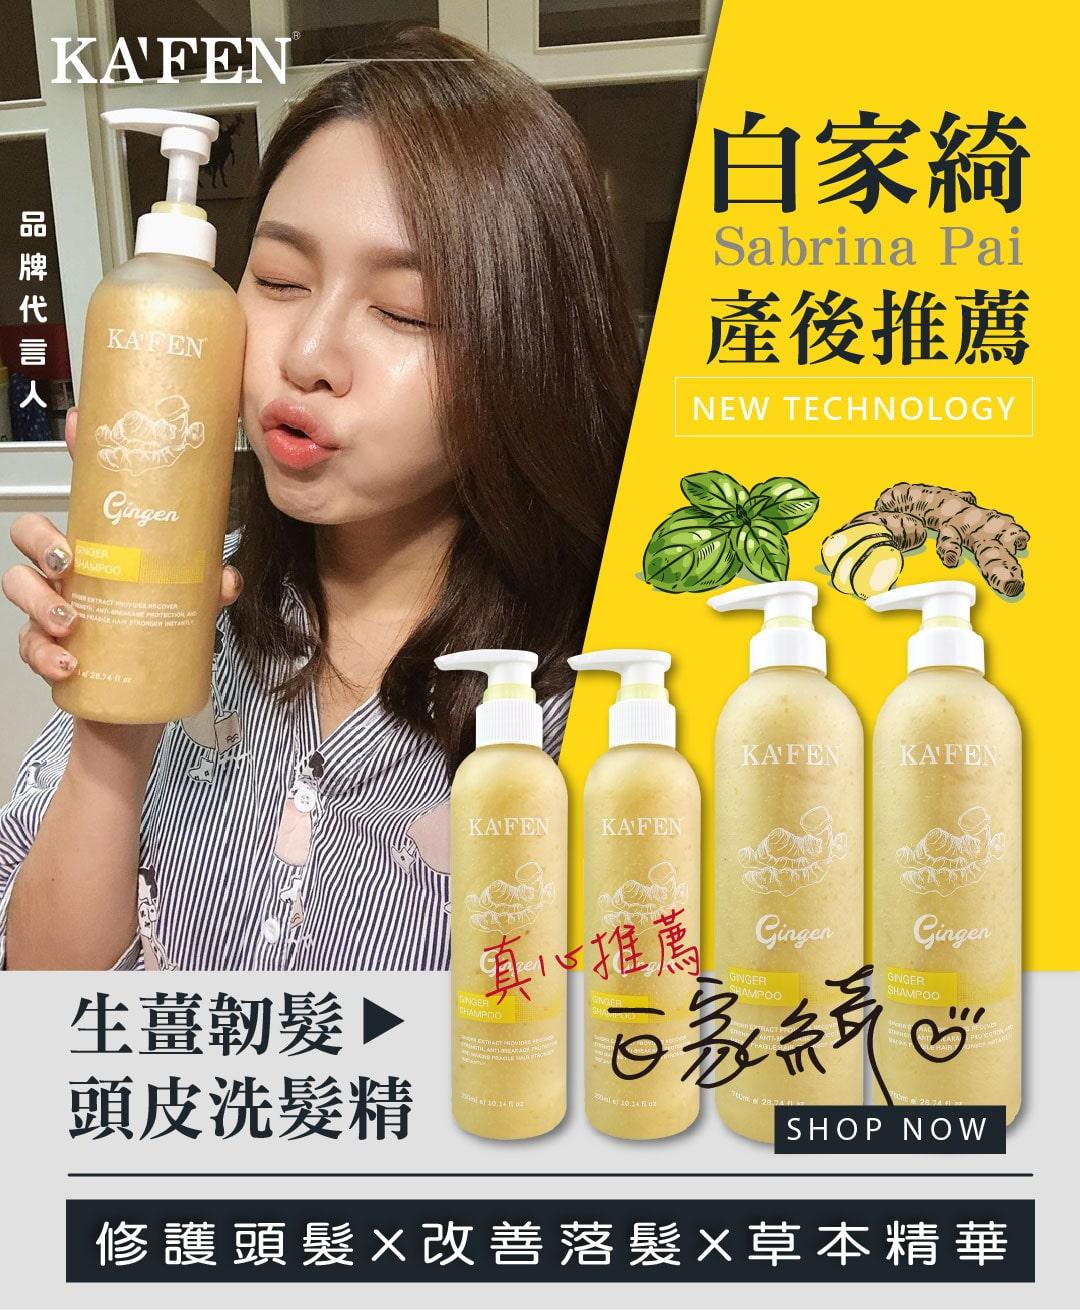 Kafen Ginger Shampoo - Ambassador